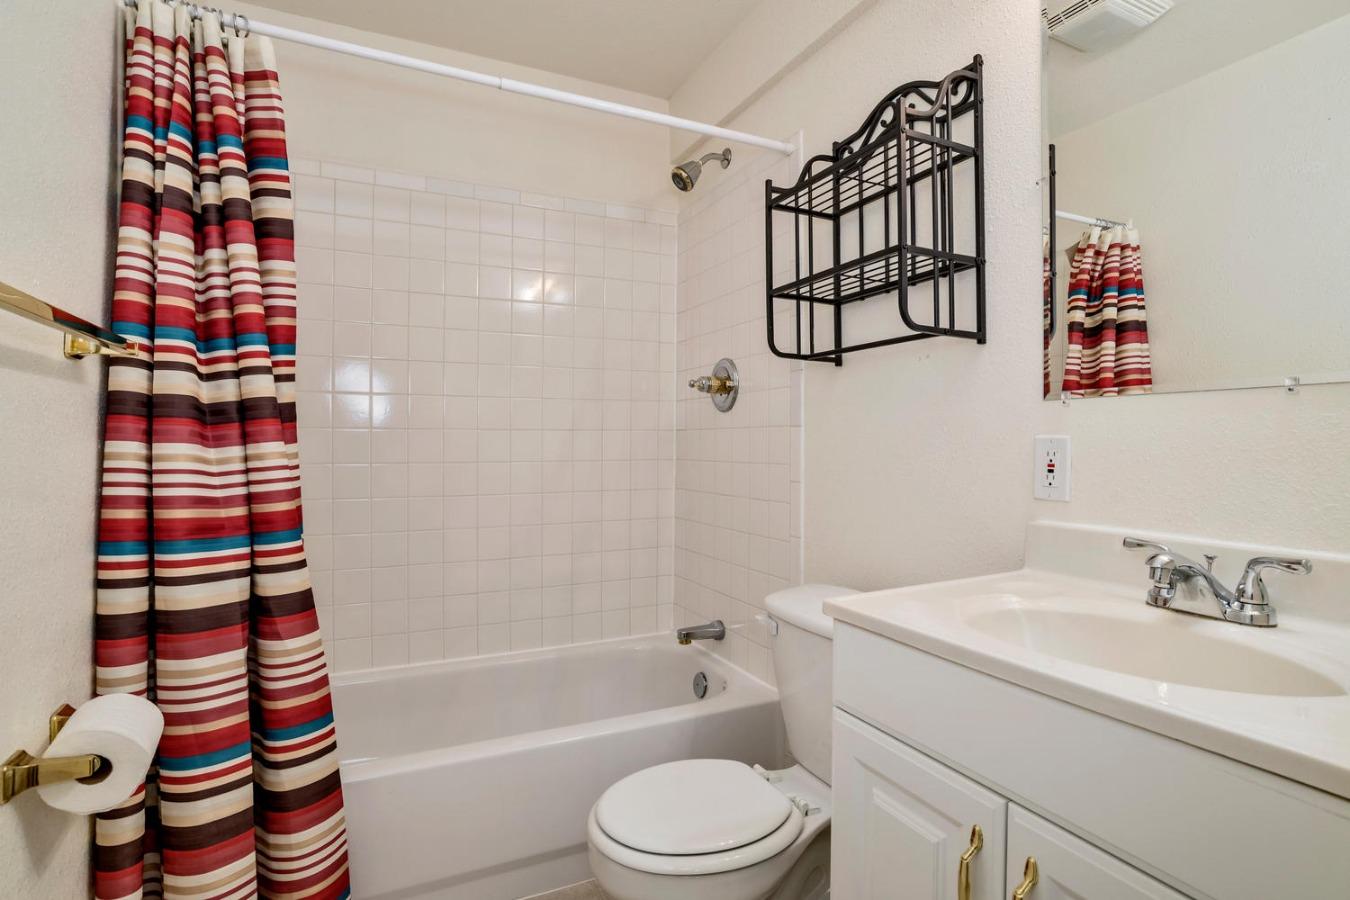 Full Bath & LArge Walk-in Closet in Basement